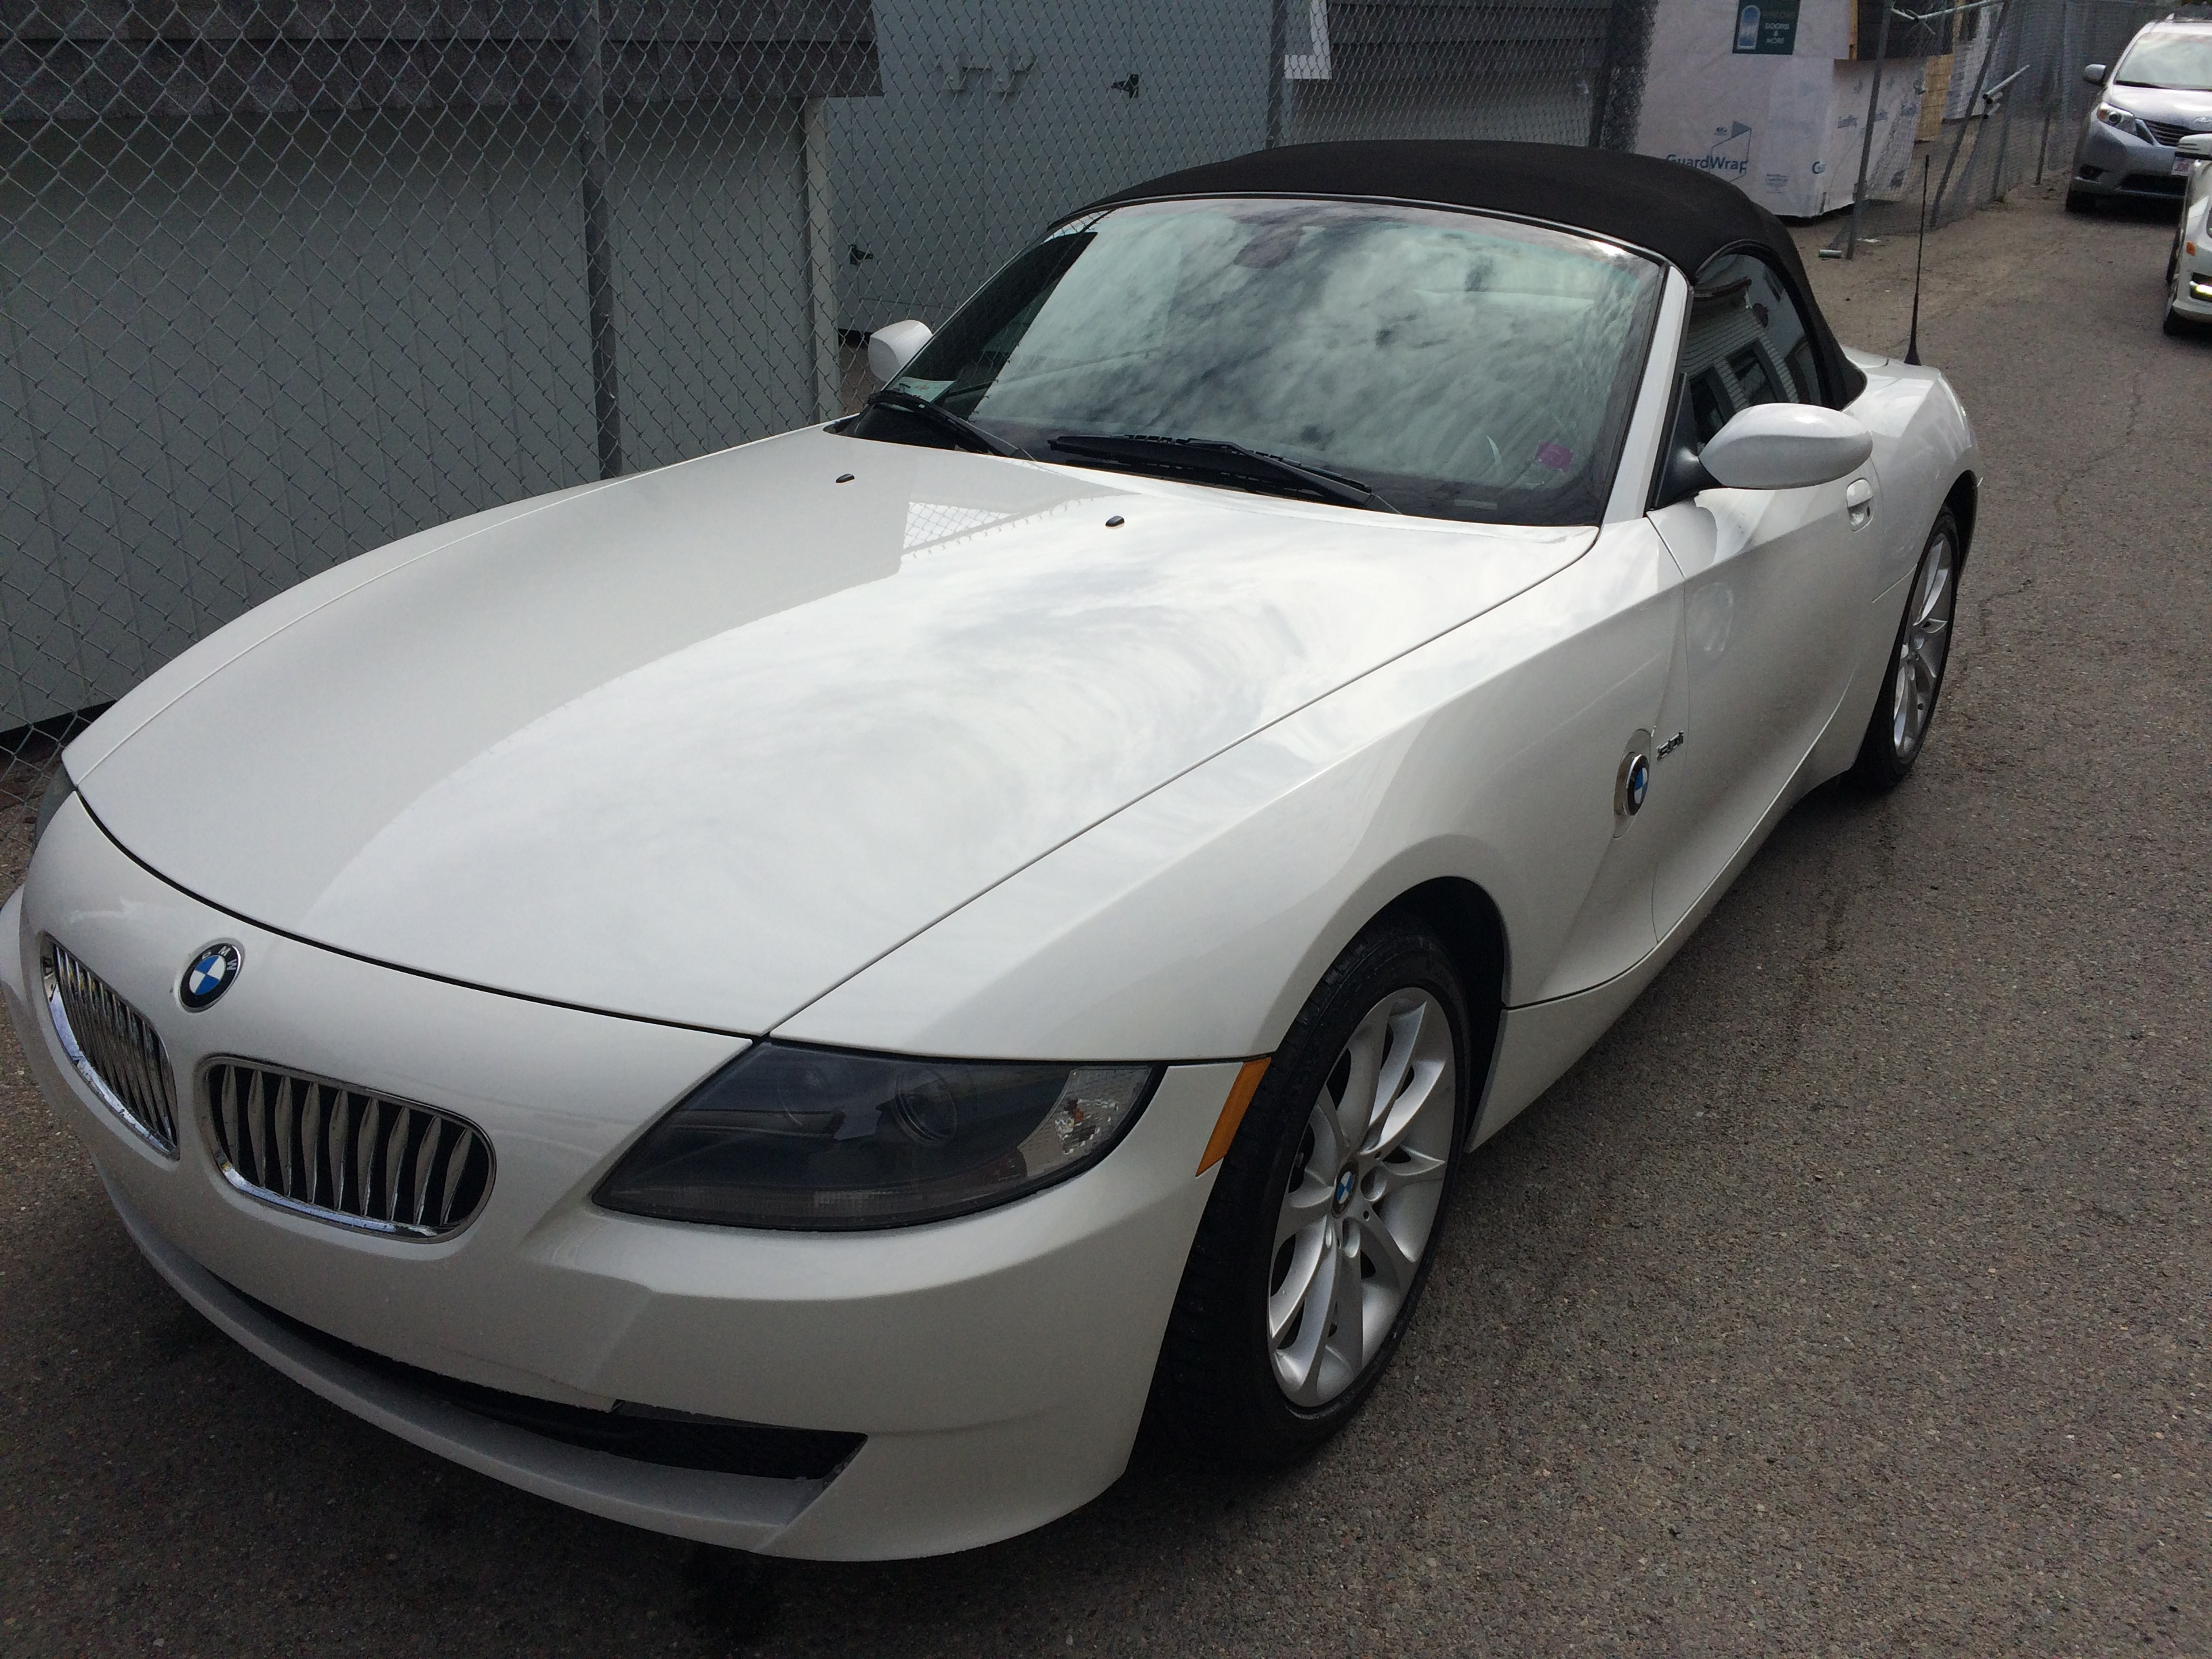 Used 2007 Bmw Z4 For Sale In Saint John Nb